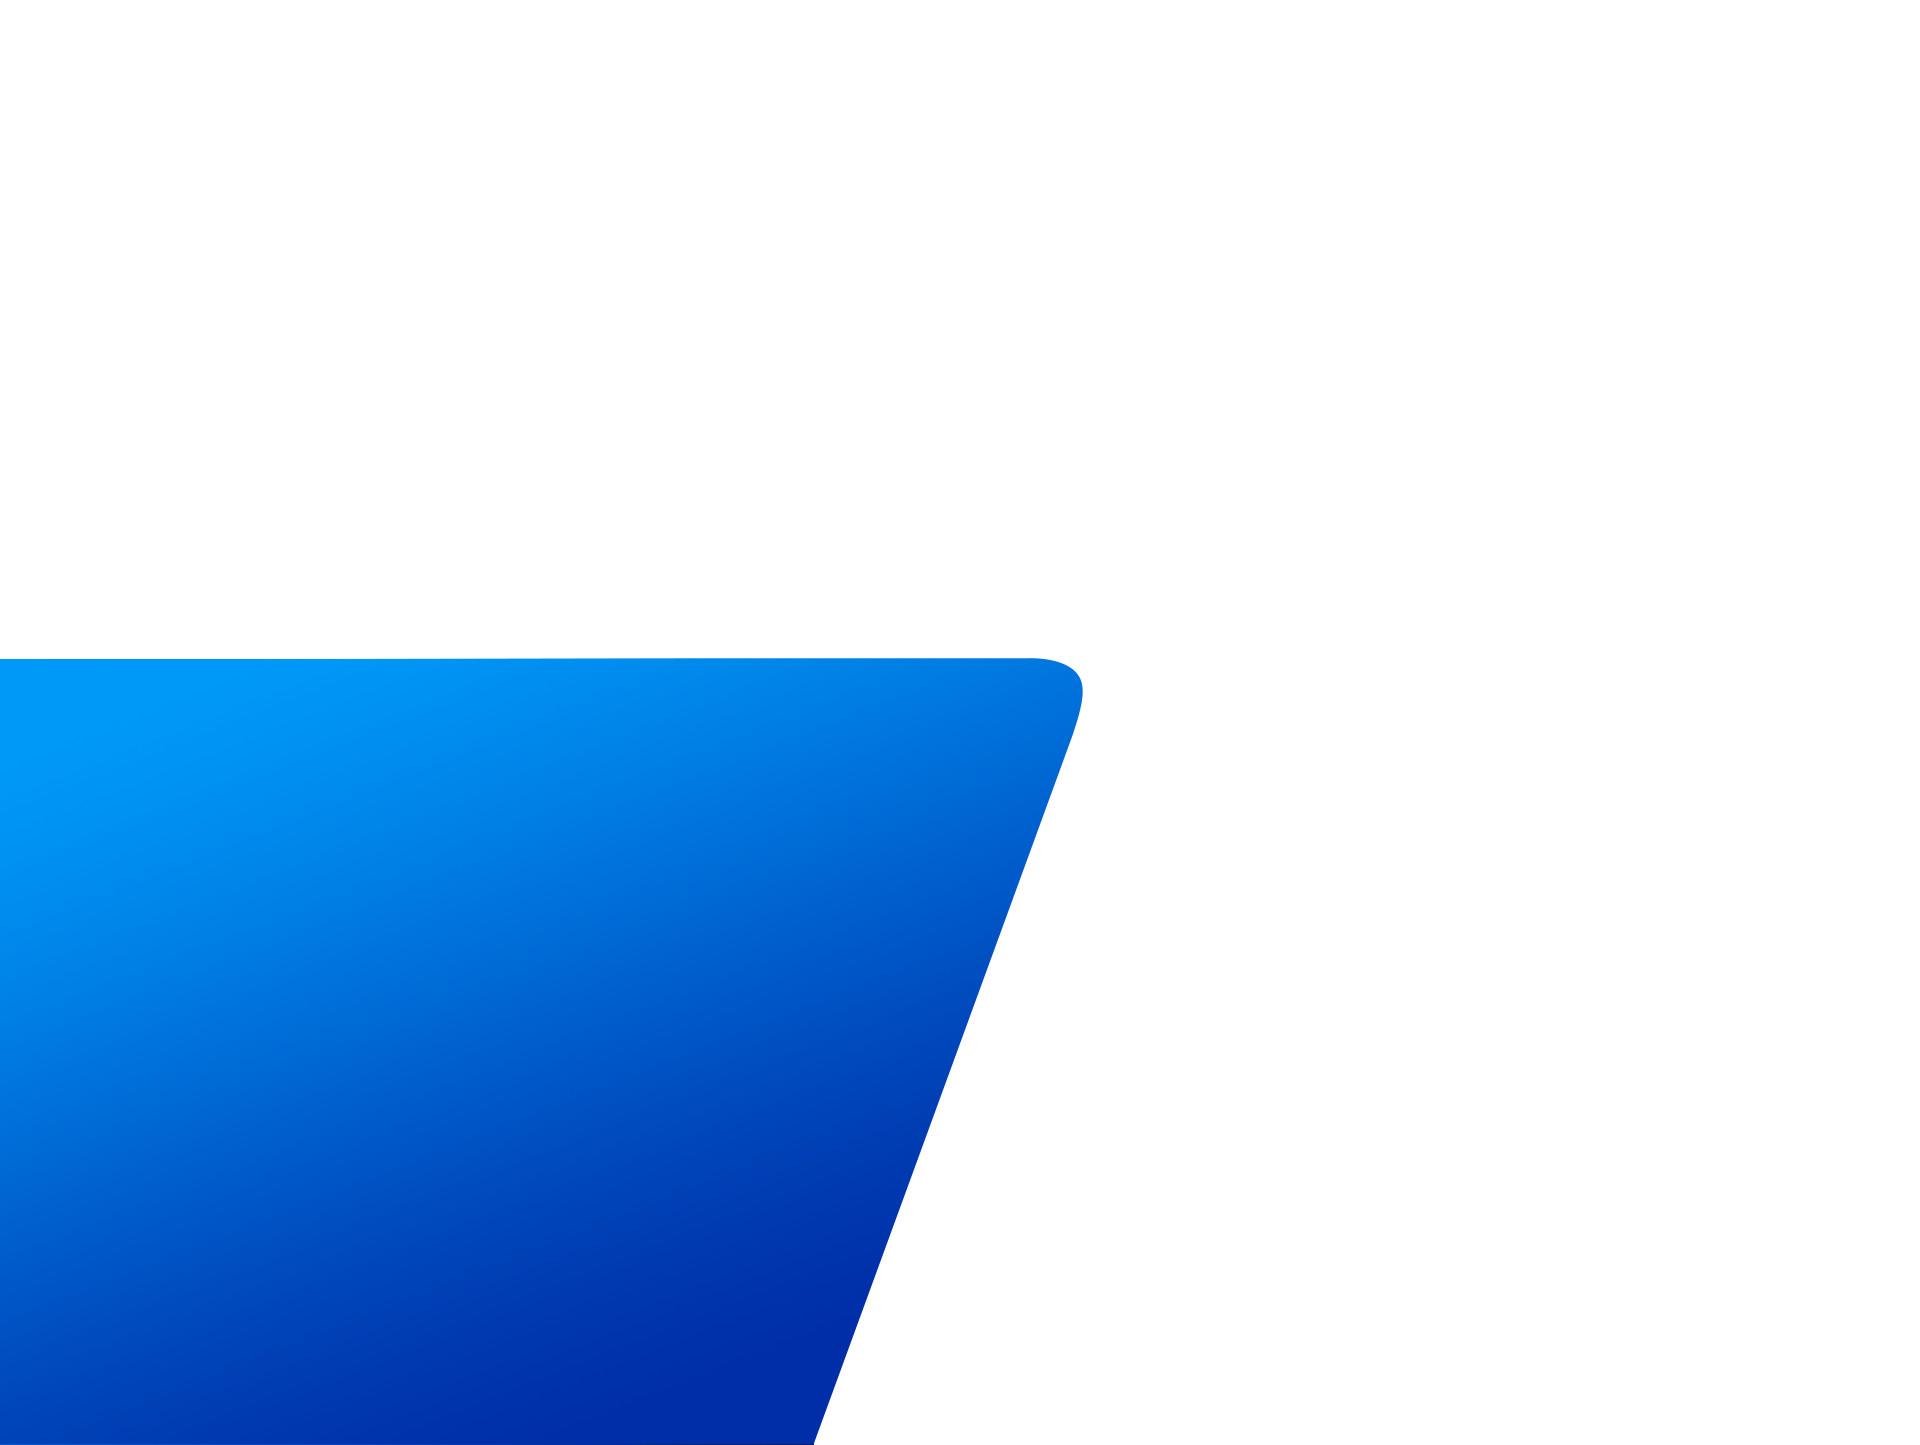 Samsung Galaxy S6 Edge Hd Wallpaper 56: Sfondi S7 Edge 4K (56+ Immagini